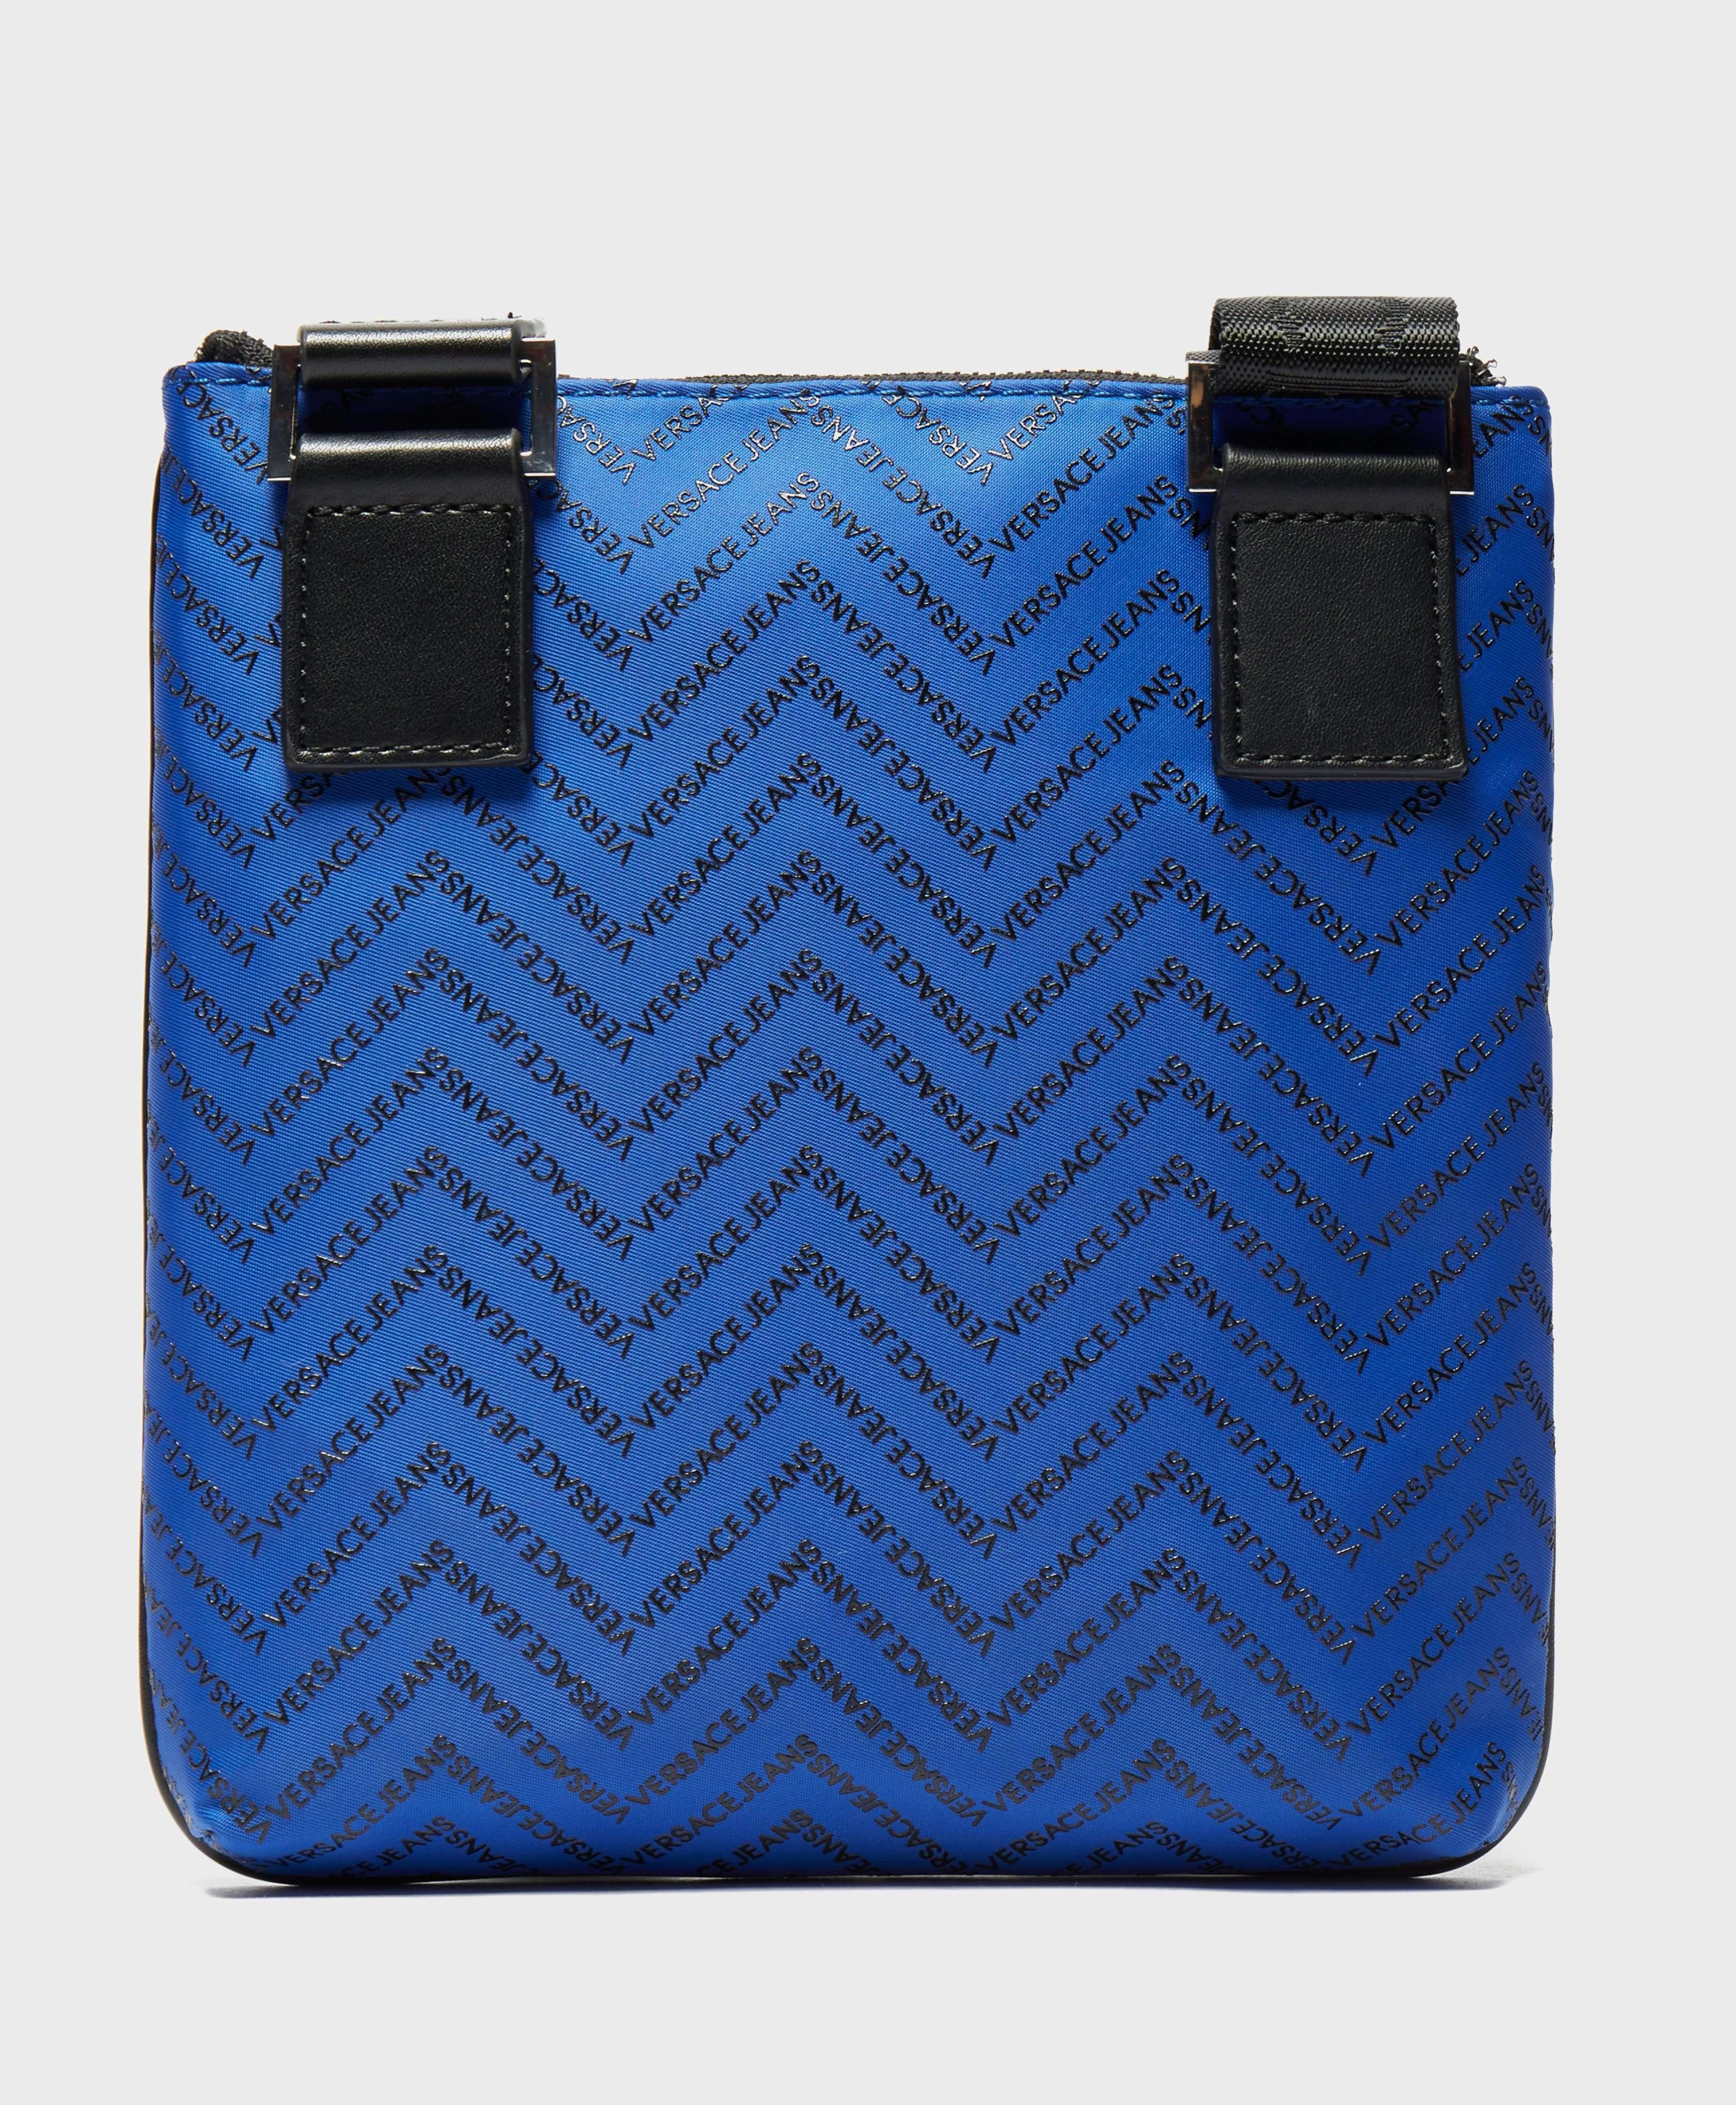 Versace Jeans Linea Chevron Small Item Bag